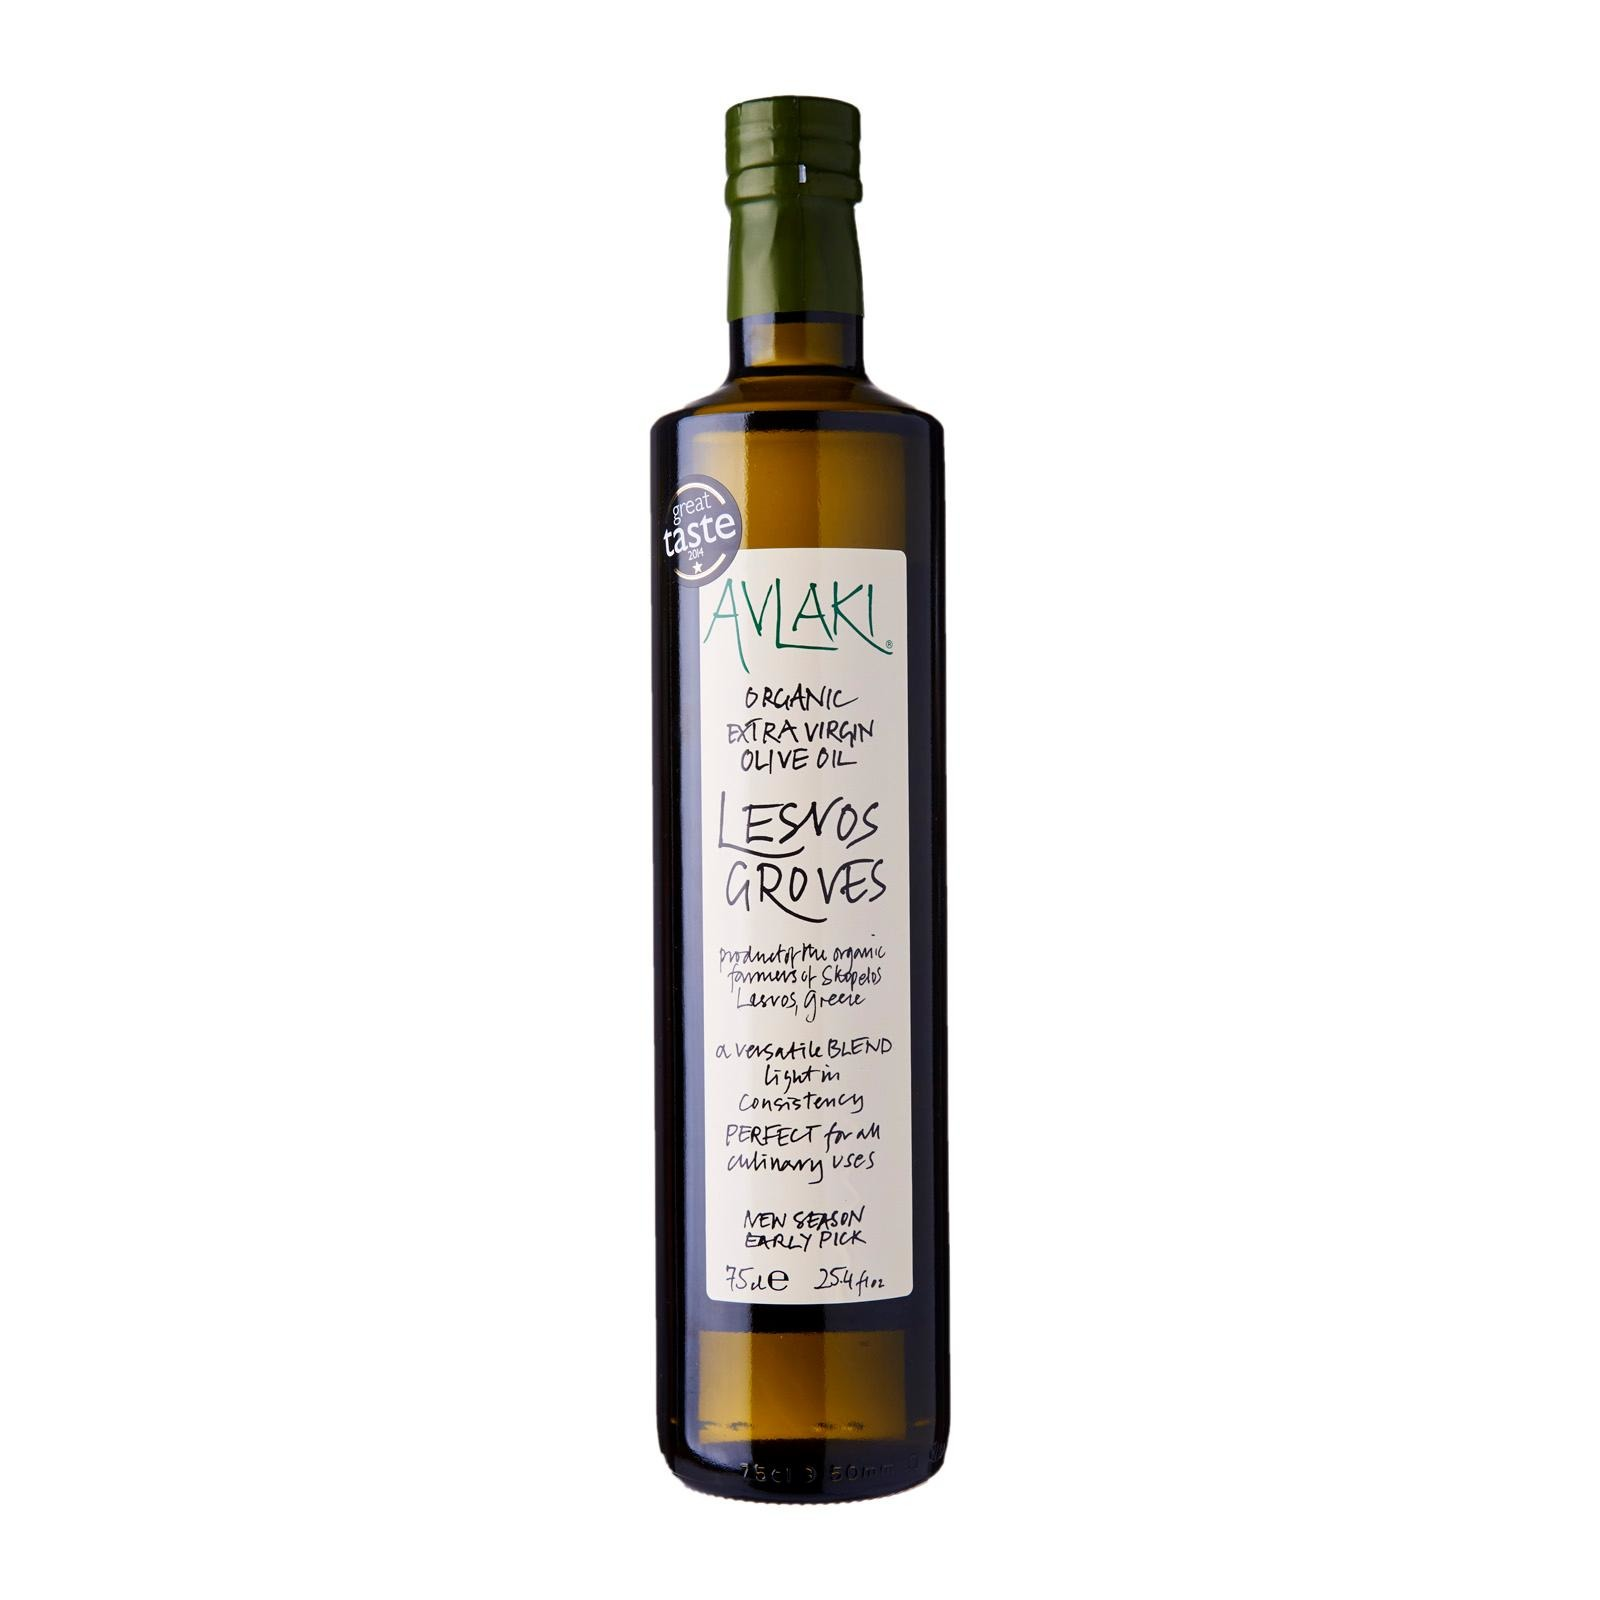 Avlaki Lesvos Groves Extra Virgin Organic Olive Oil